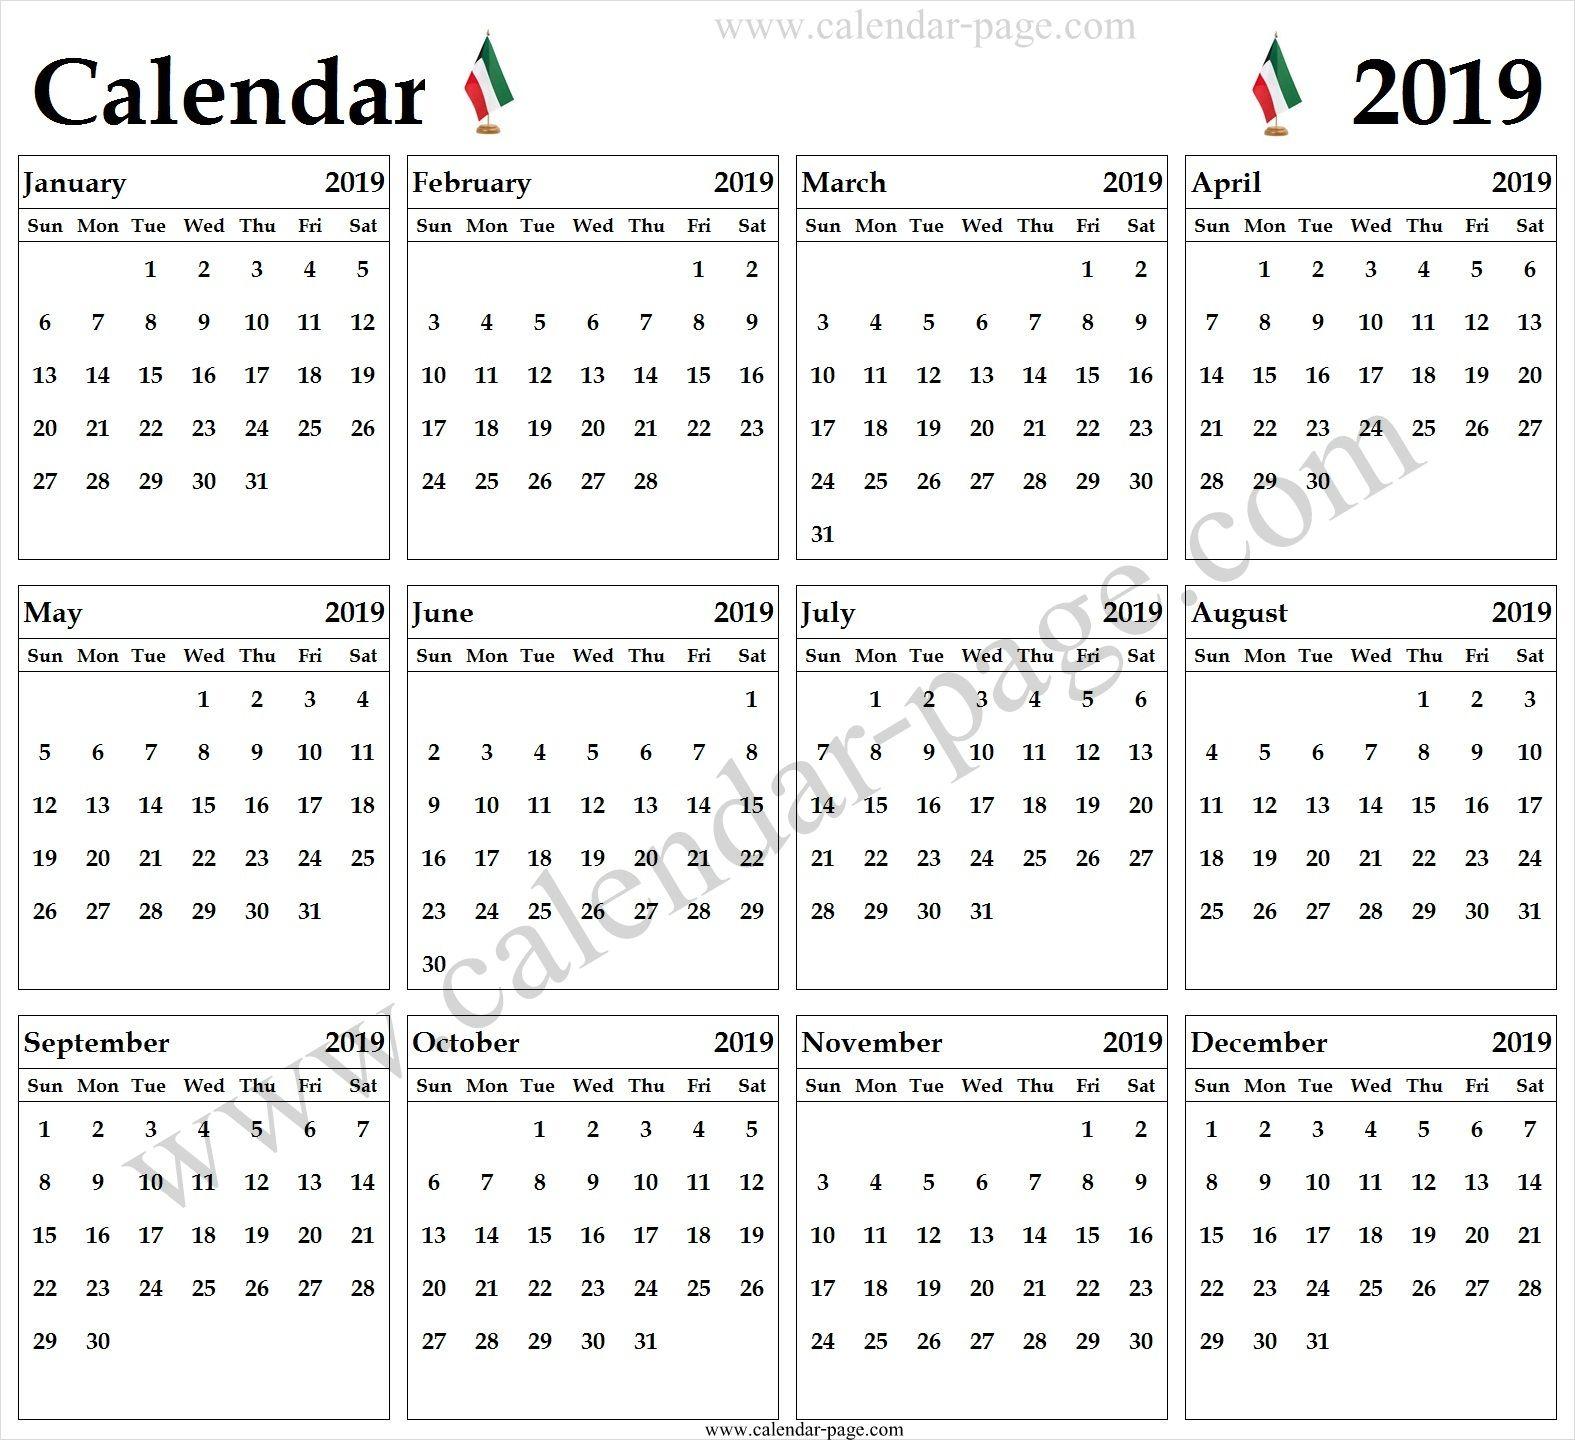 Kuwait Calendar 2019 Blank 2019 Calendar Pdf 2019 Calendar